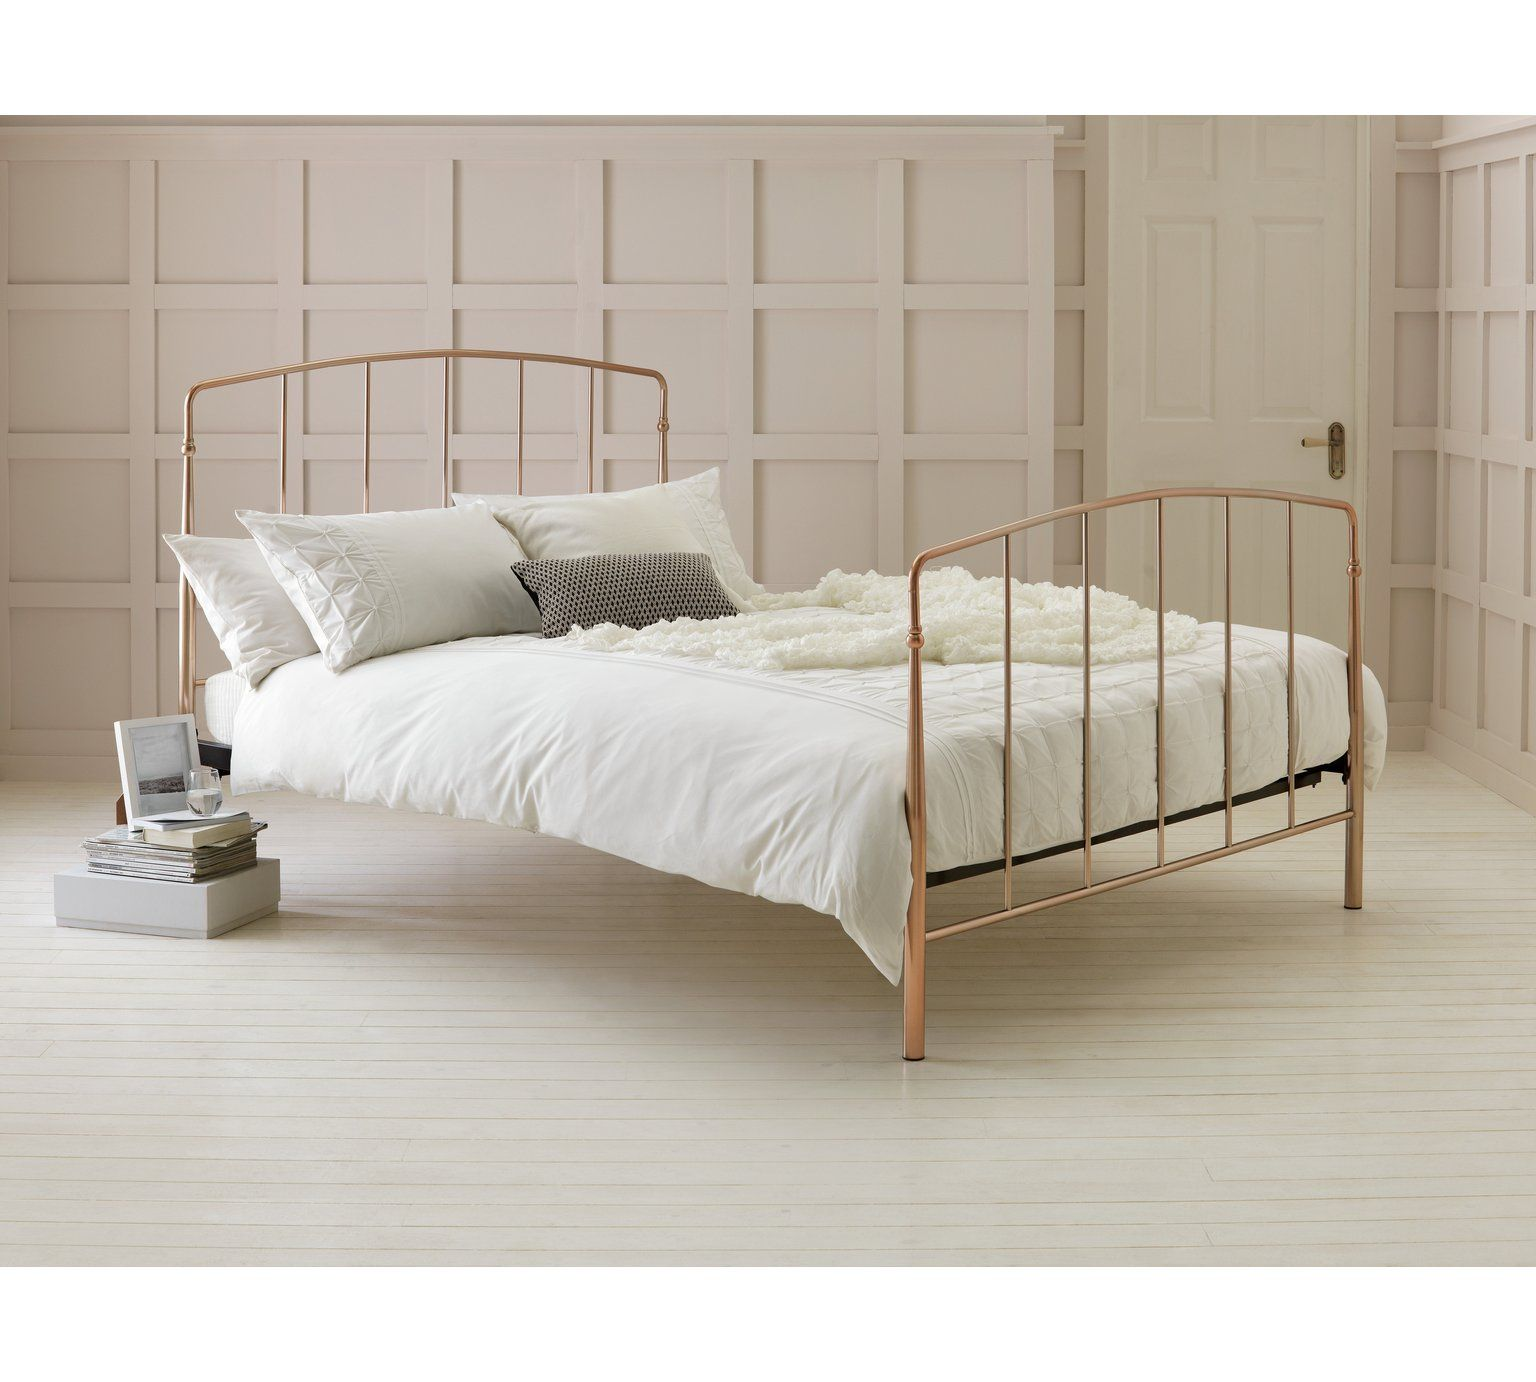 Buy Argos Home Aurelie Double Bed Frame Rose Gold